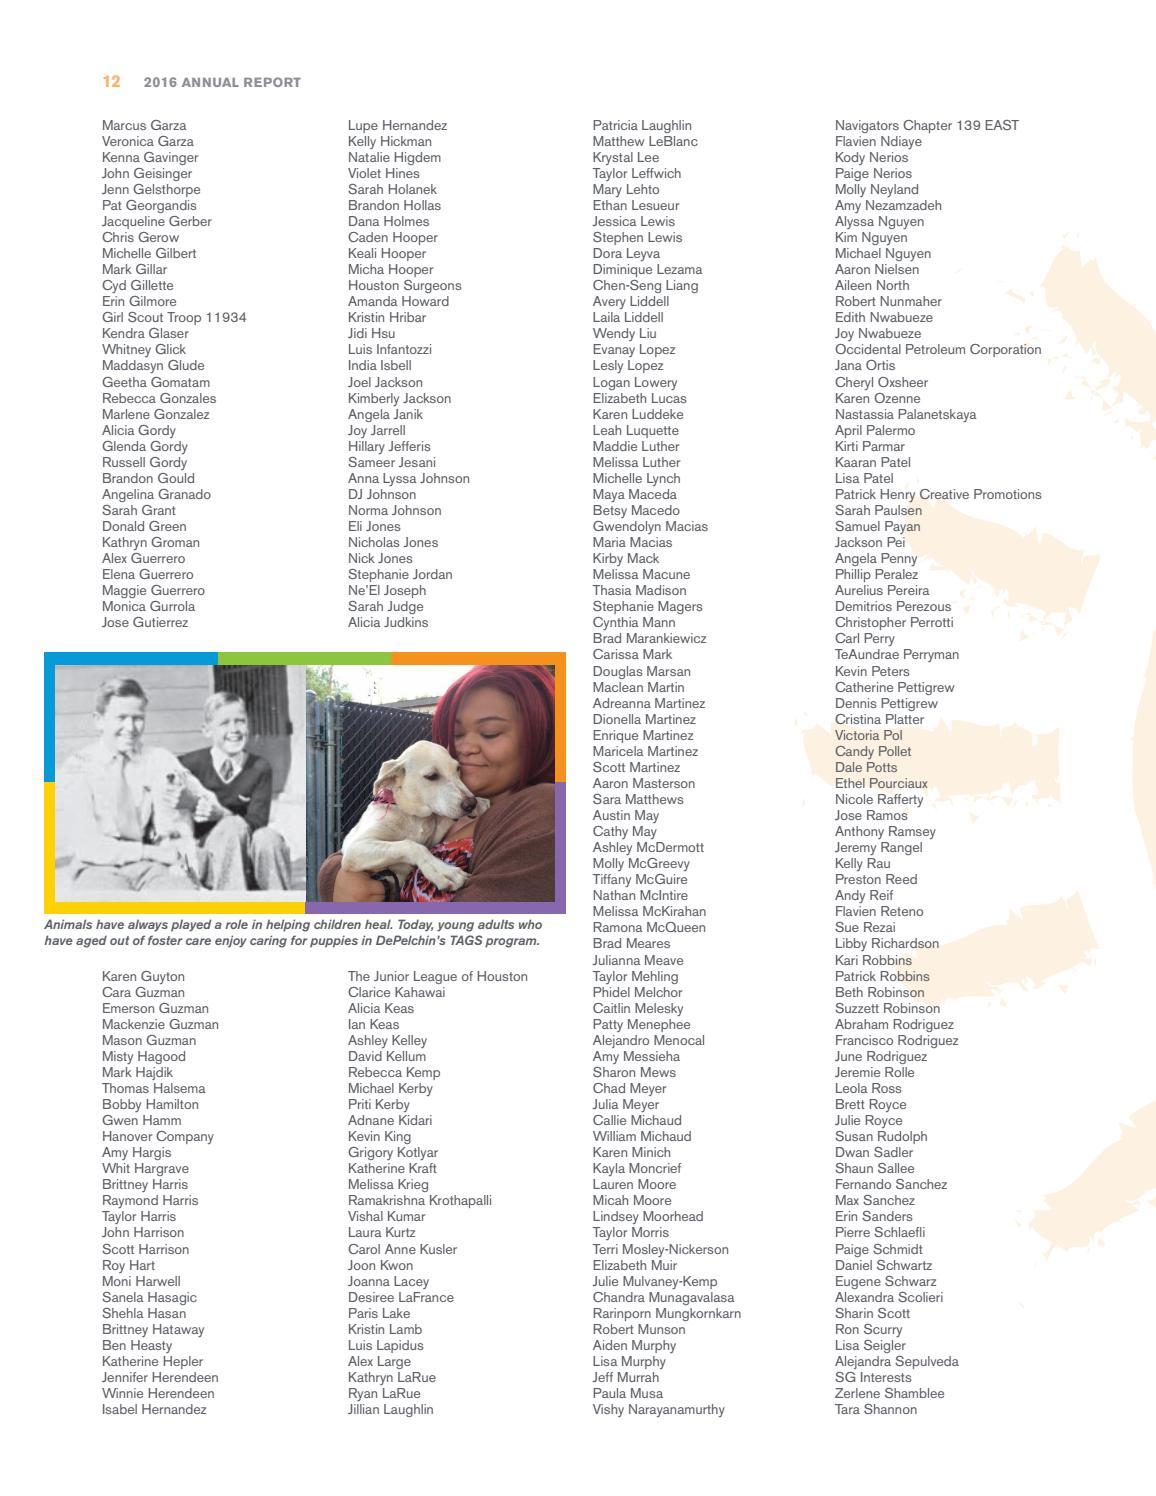 2016 Annual Report by DePelchin Children's Center - Issuu